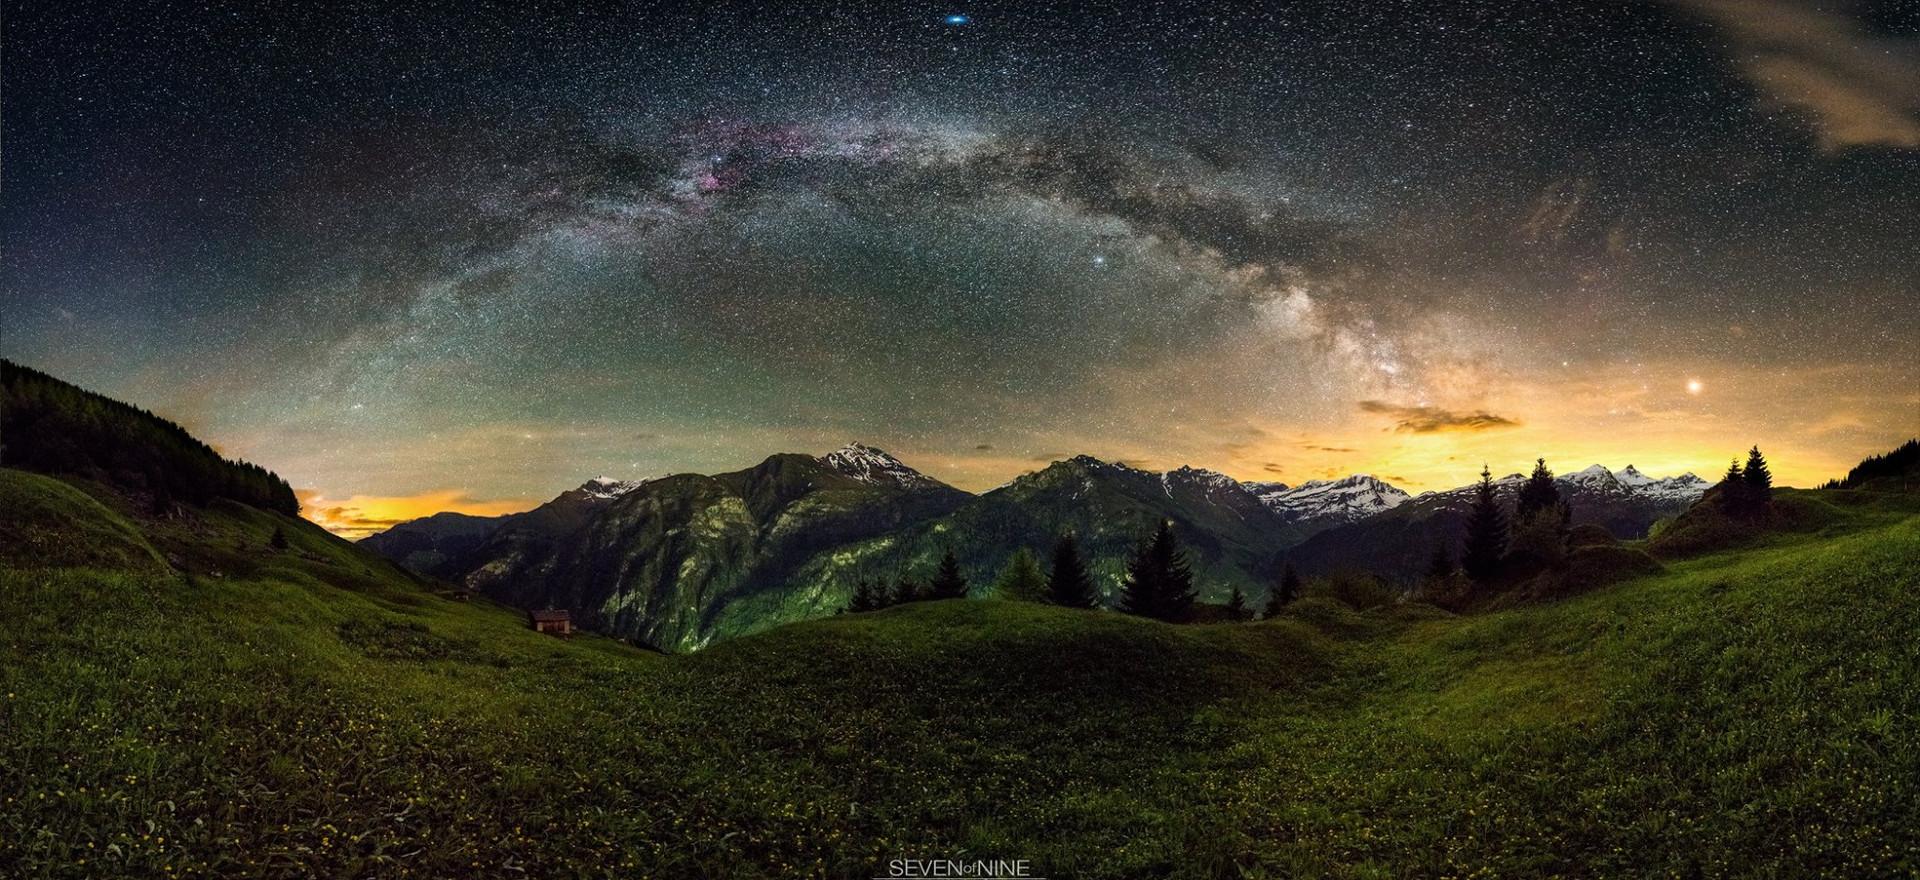 cosmic art photography